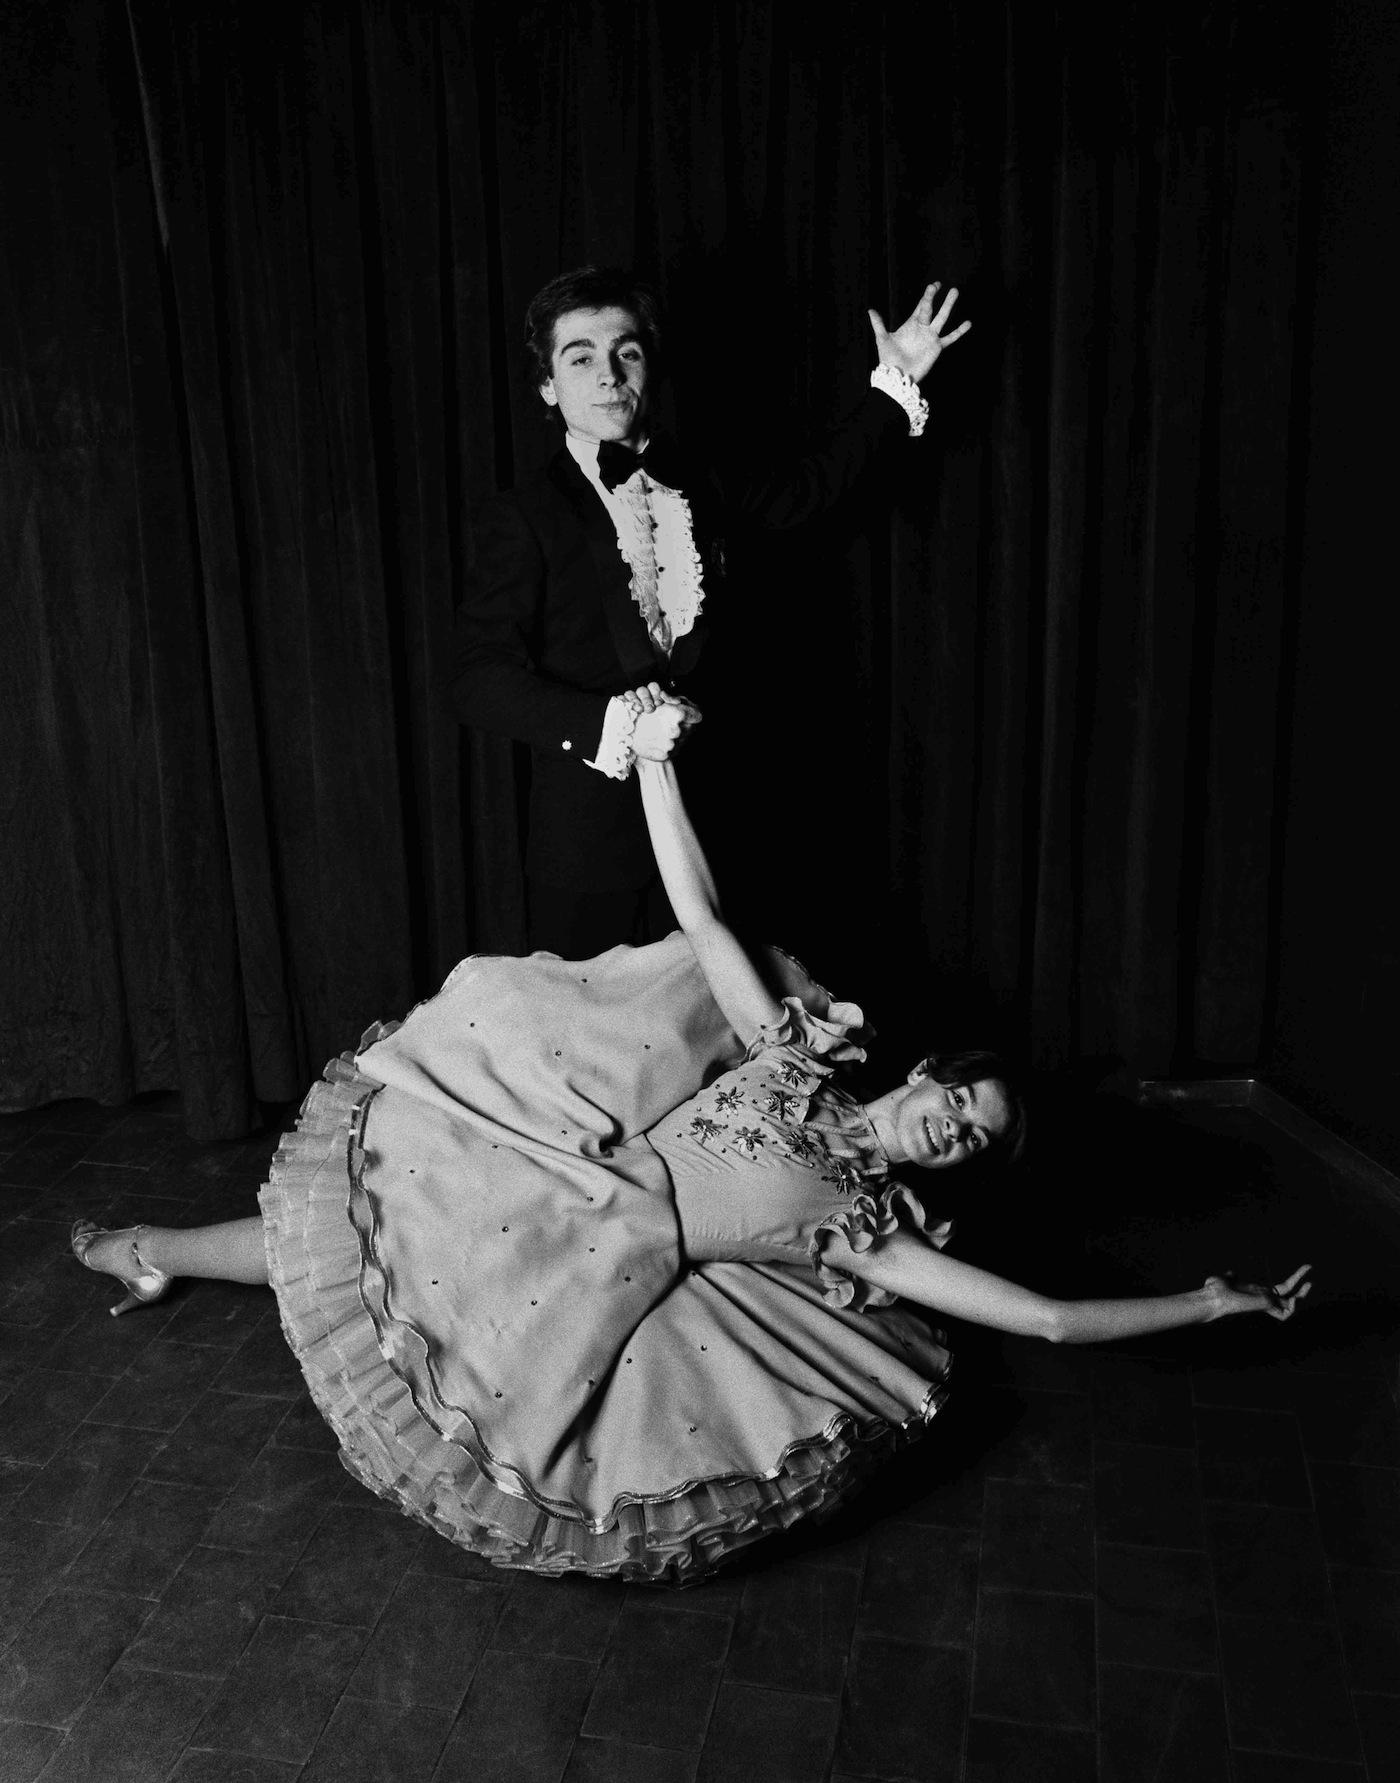 Gabriele Basilico, Dancing in Emilia, 1978 @ Gabriele Basilico